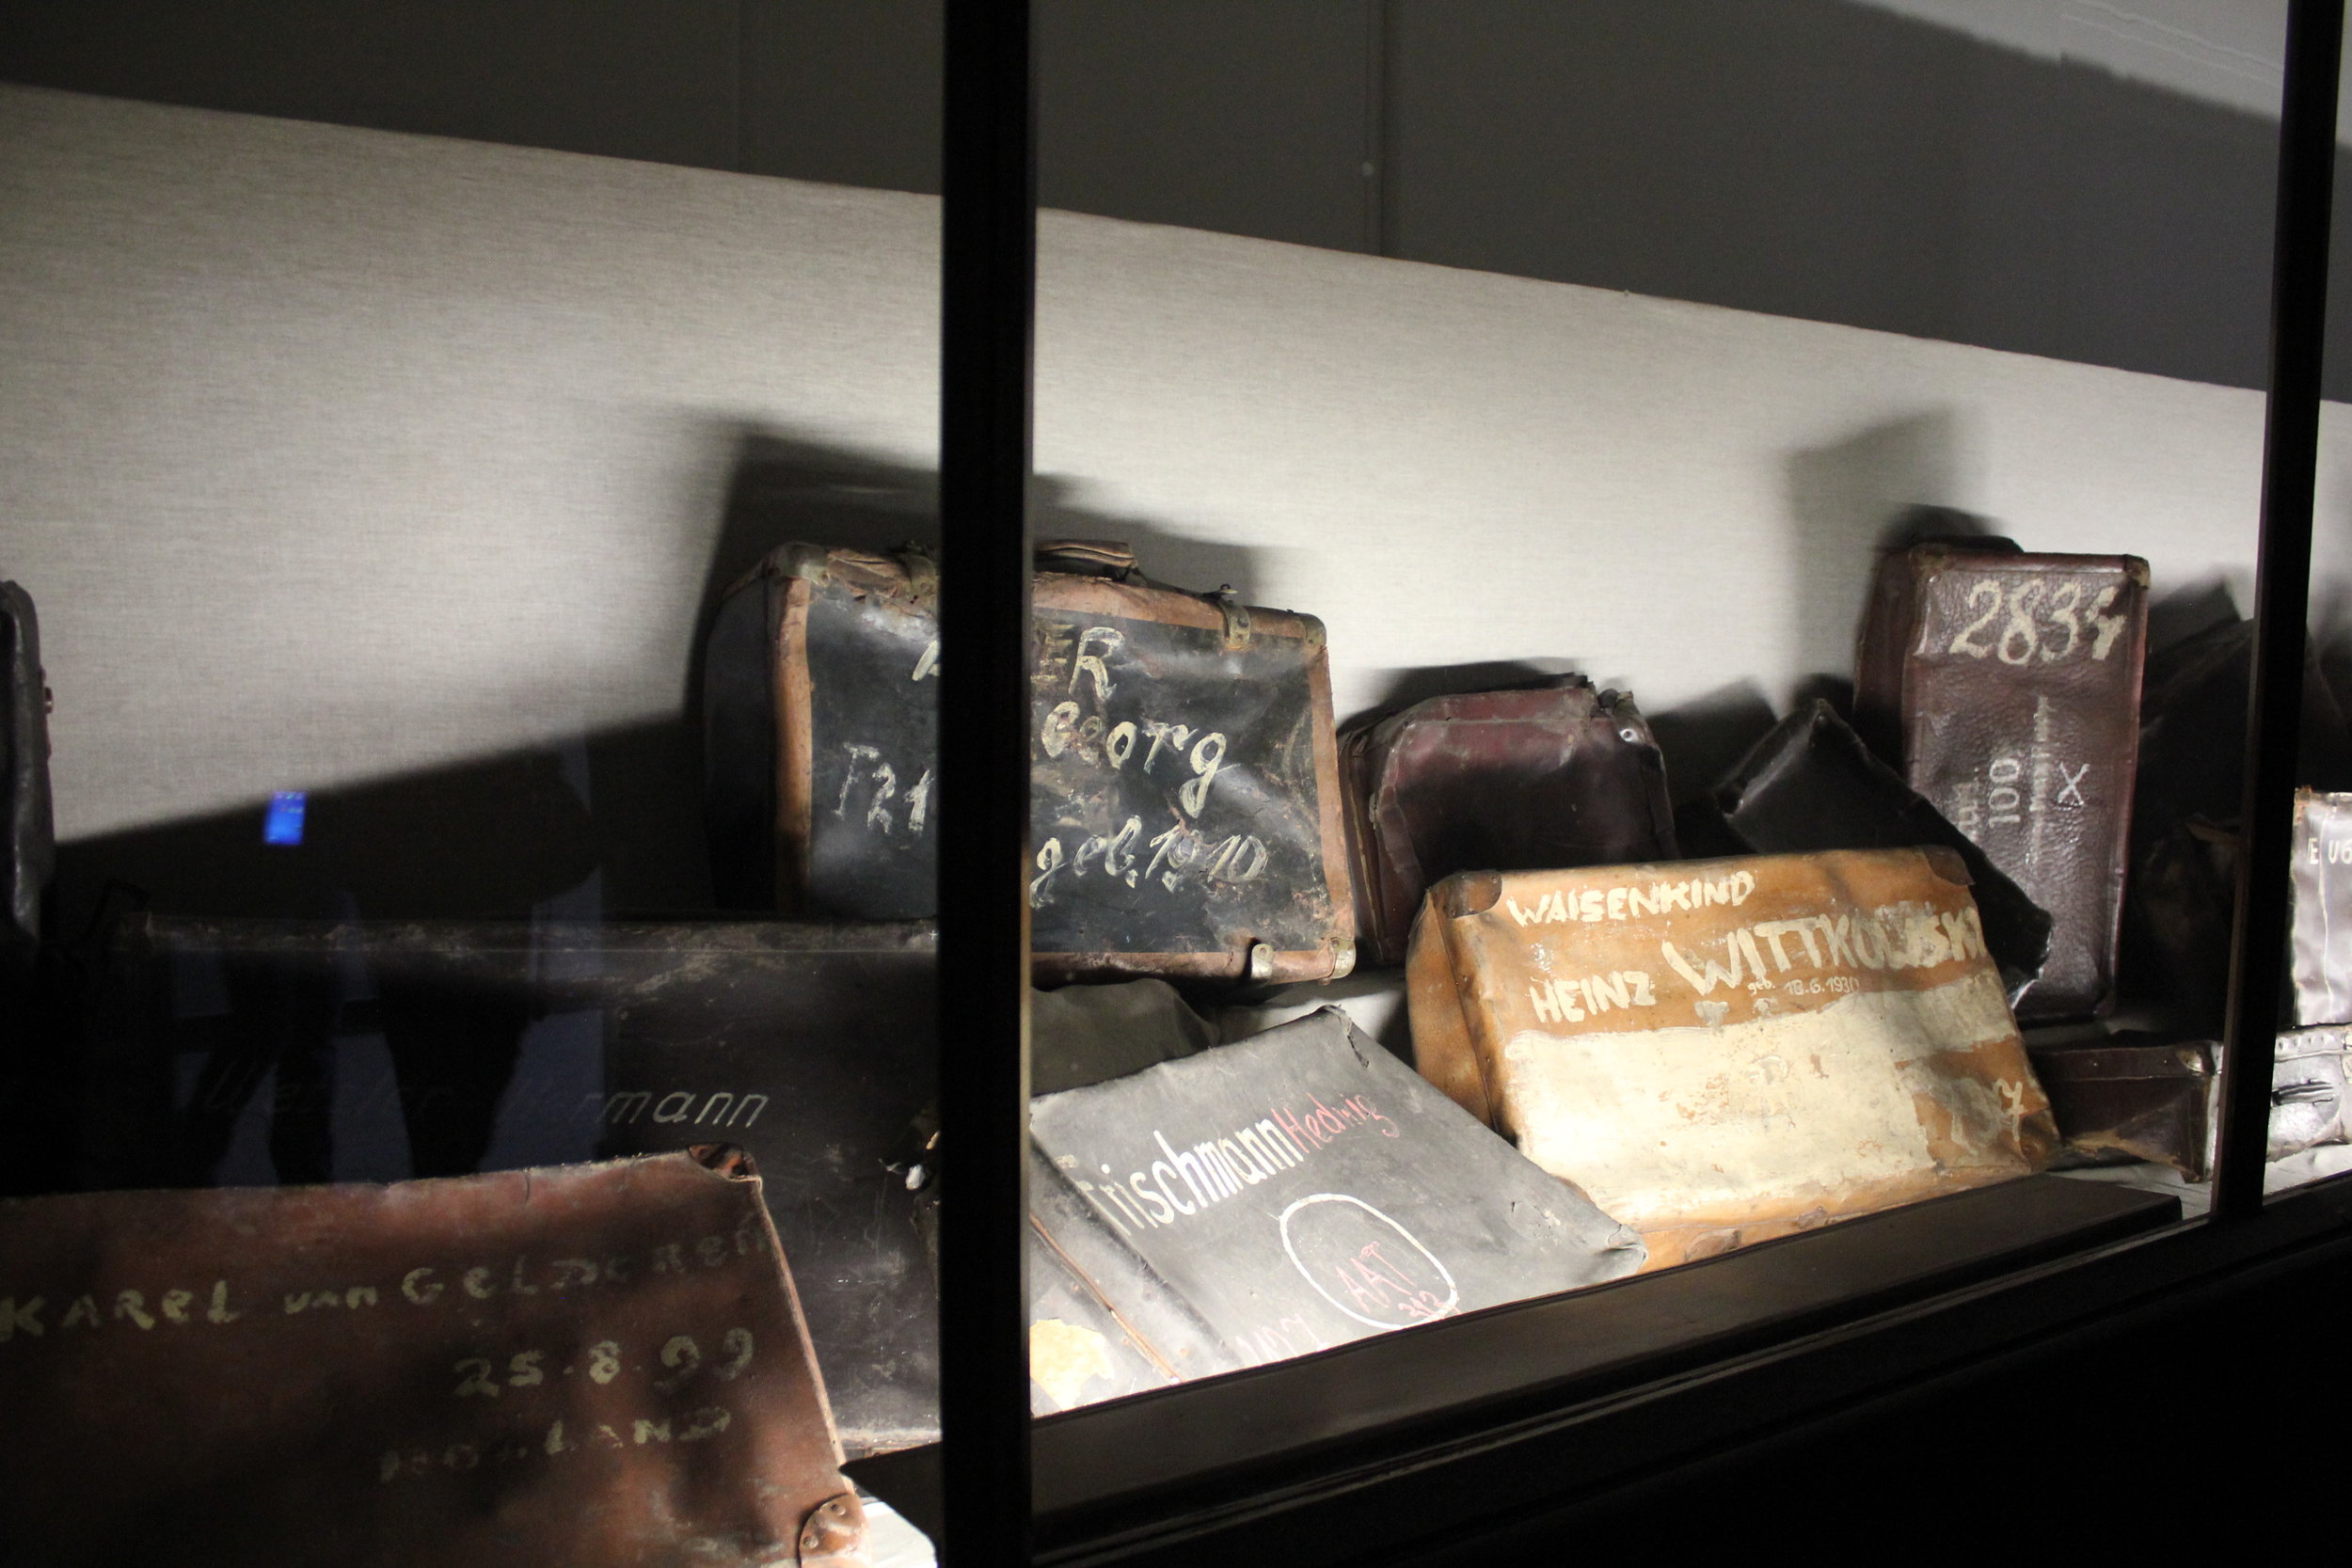 Victims' belongings